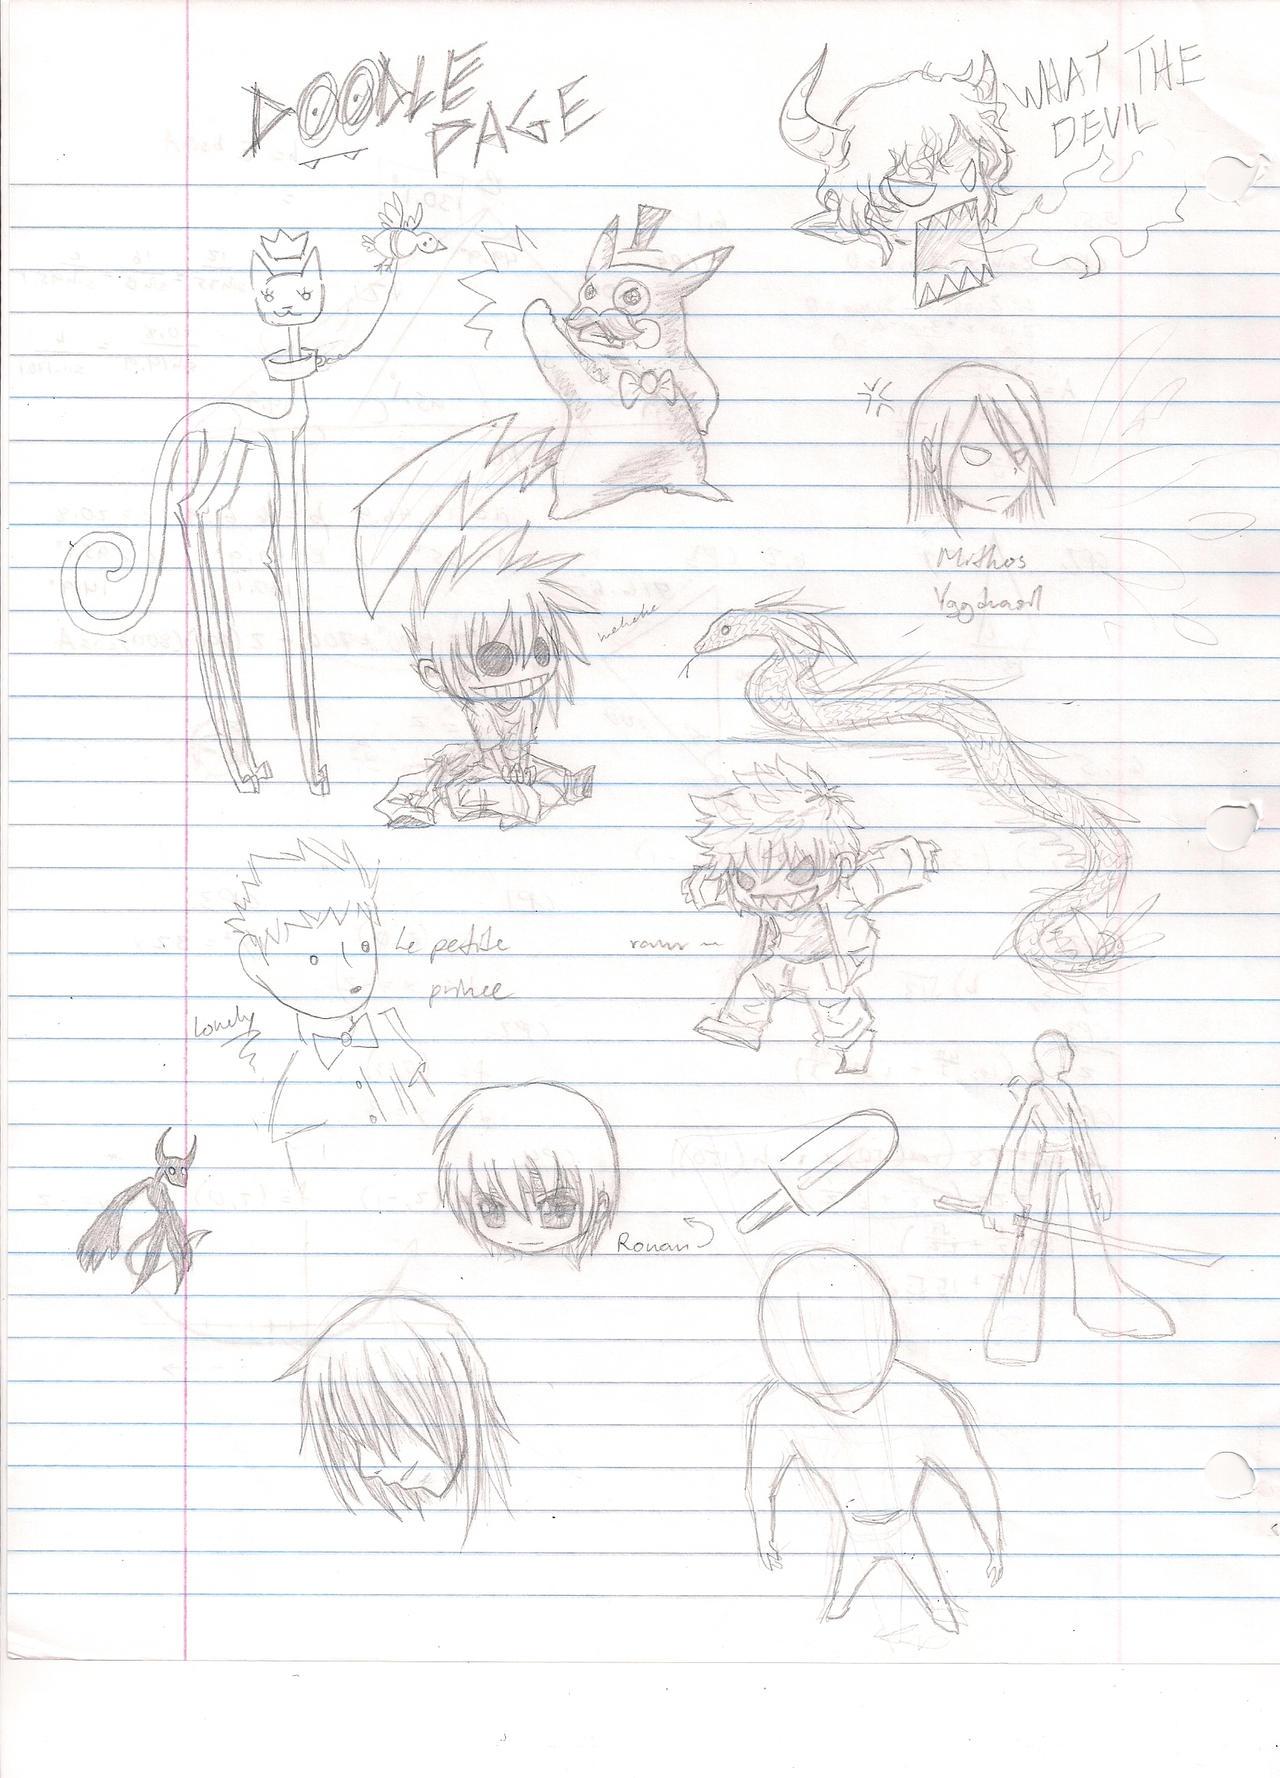 Doodle again by AnonXeidrii